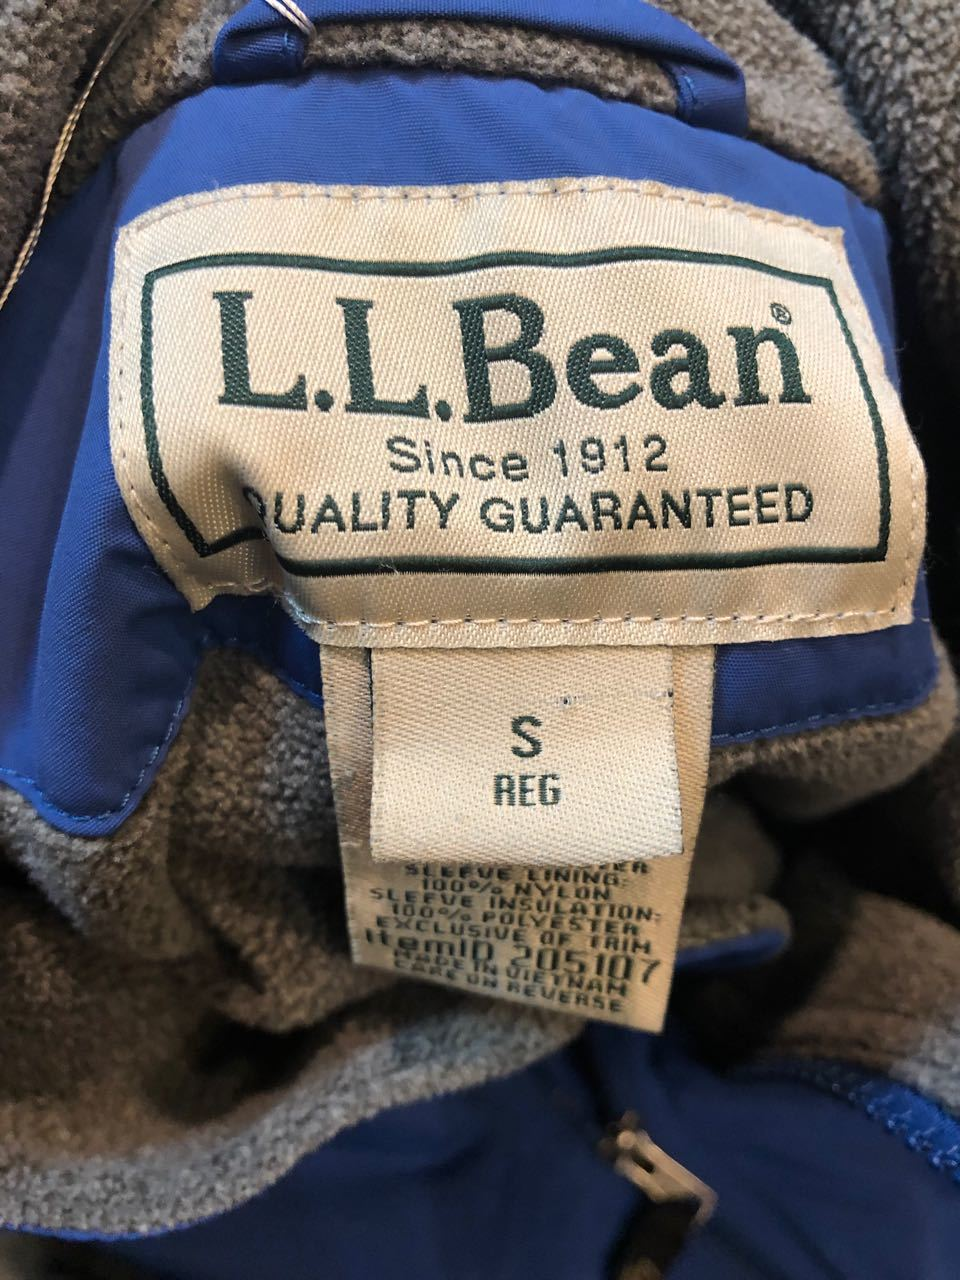 L.L Bean WARM UP JACKET ウォーム アップジャケット_c0144020_13463542.jpg